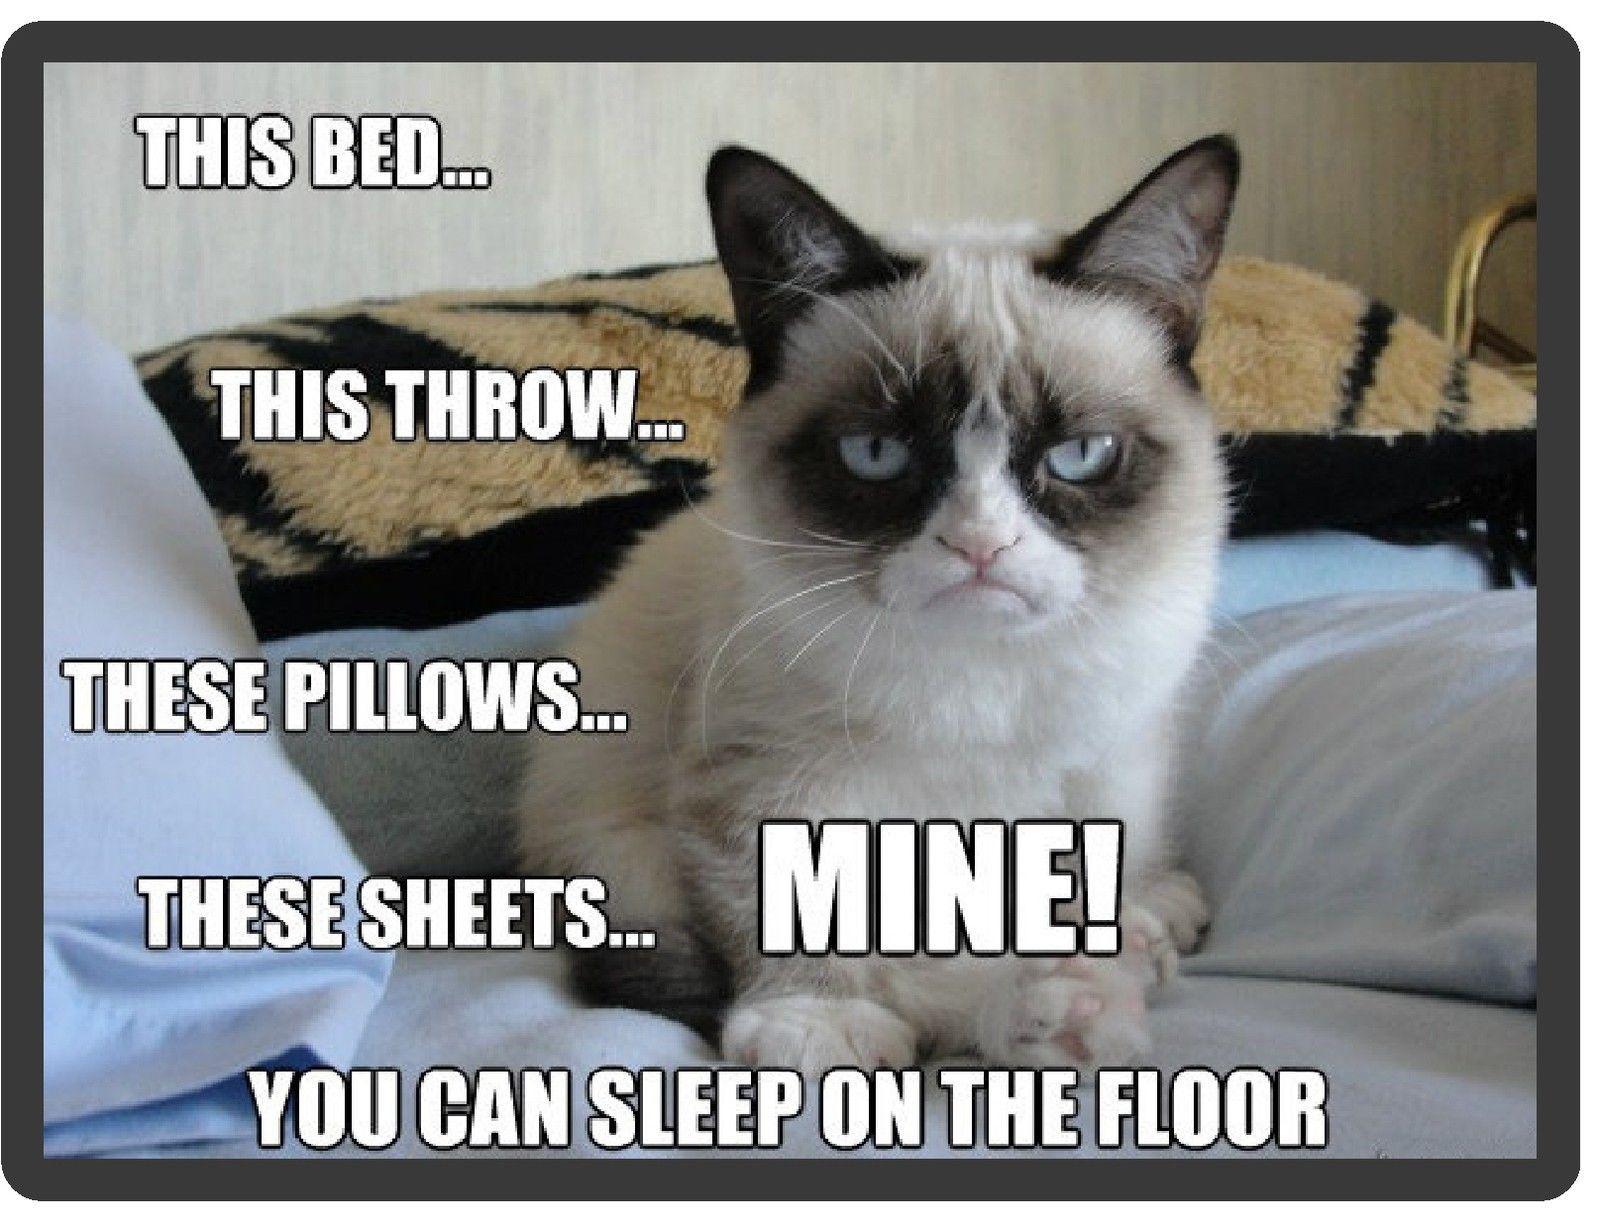 $55  Funny Grumpy Cat Sleep On Floor Refrigerator Locker